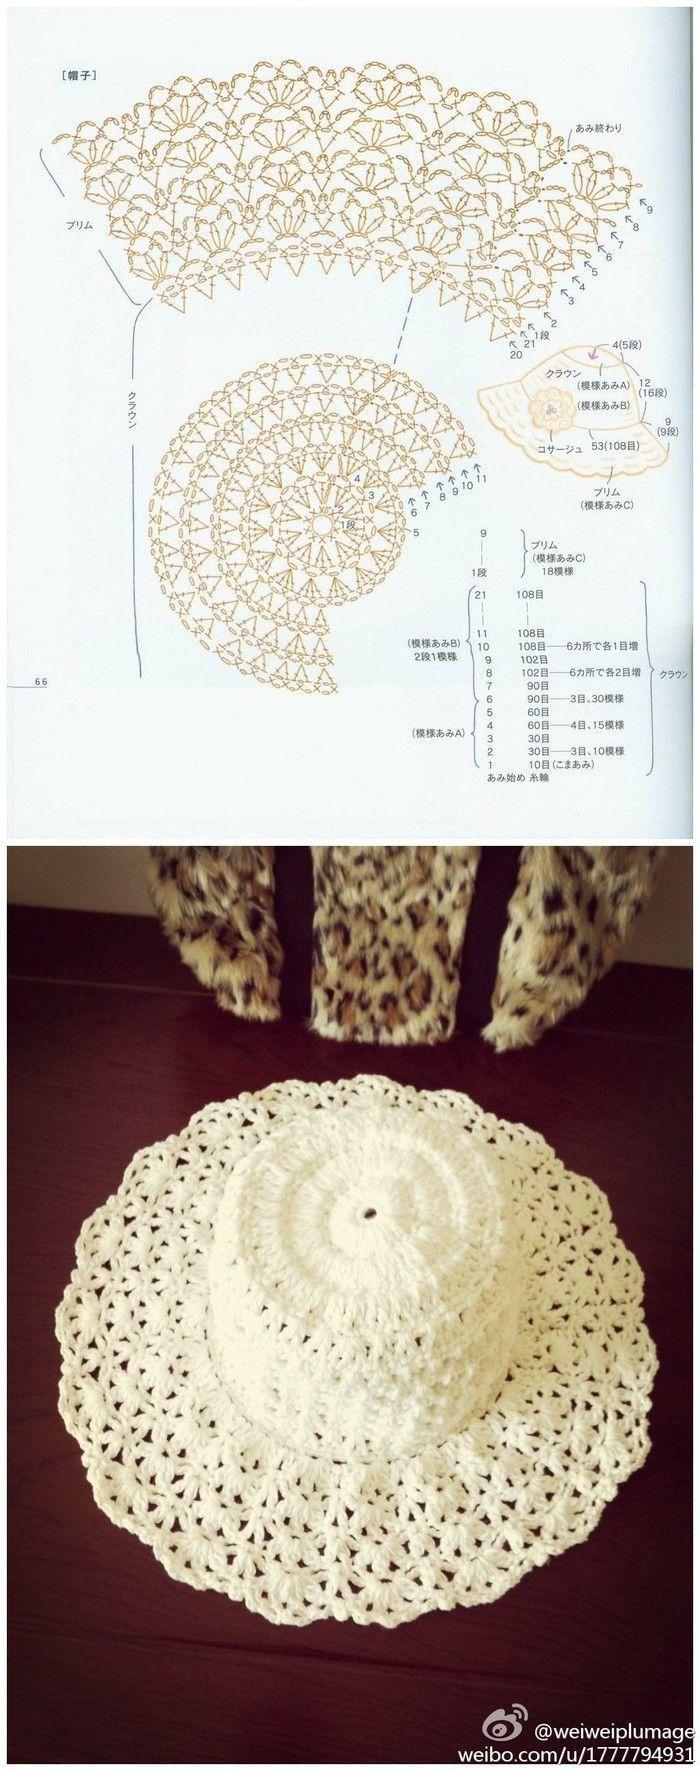 1071 best barretes boinas images on pinterest pictures un lindo sombrero crochet hat pattern bankloansurffo Choice Image